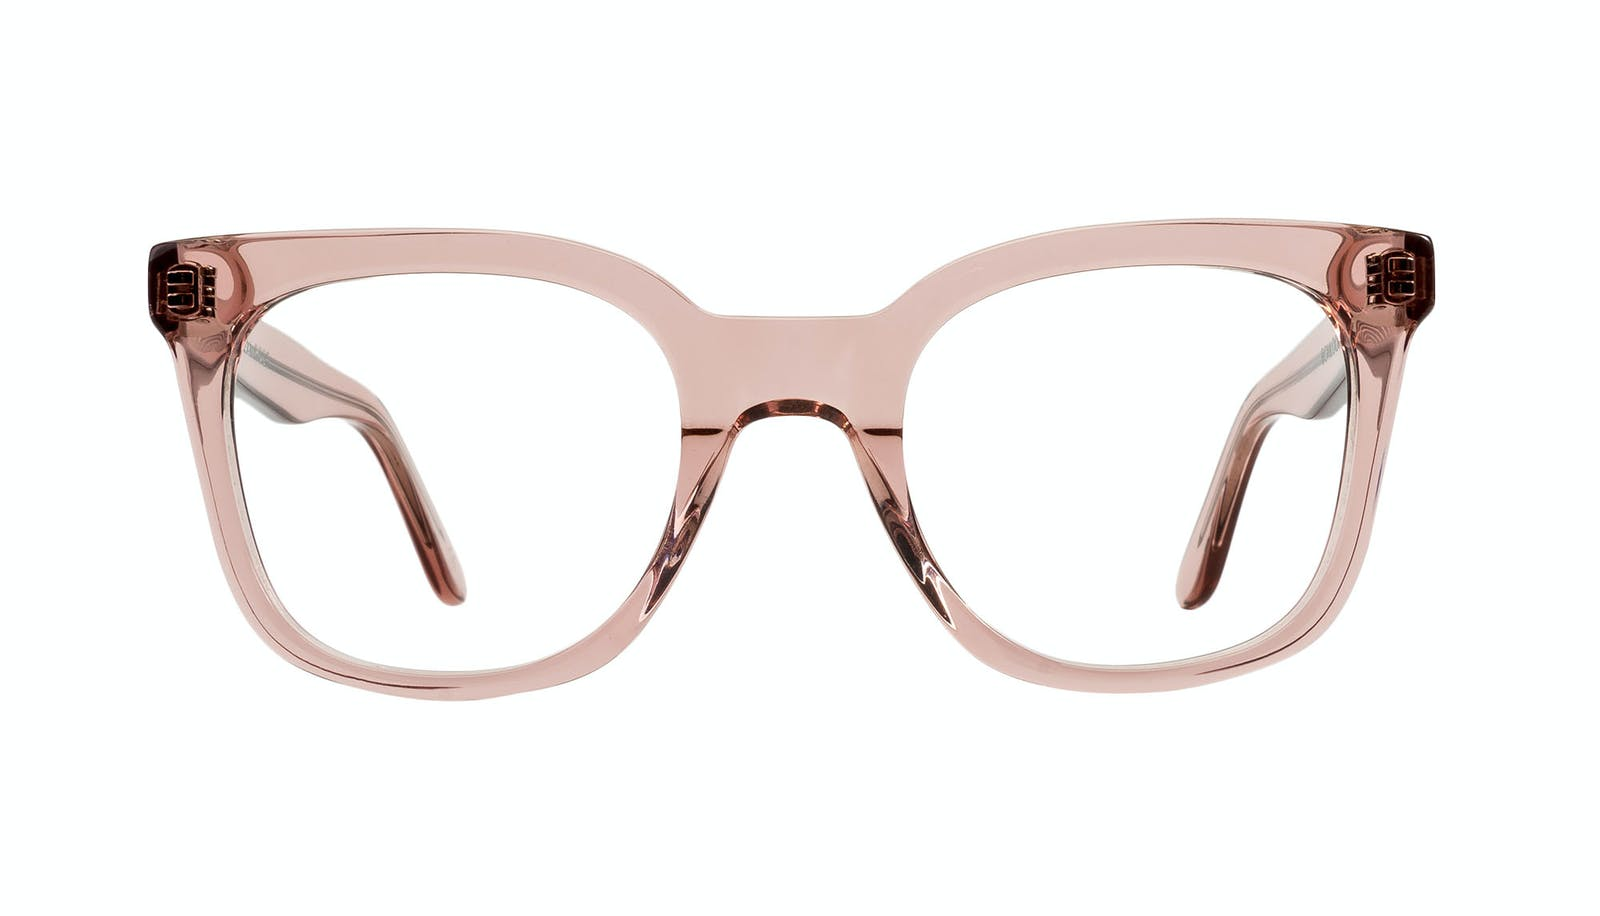 69f460a722 Affordable Fashion Glasses Rectangle Square Eyeglasses Women Jack  amp   Norma Rose